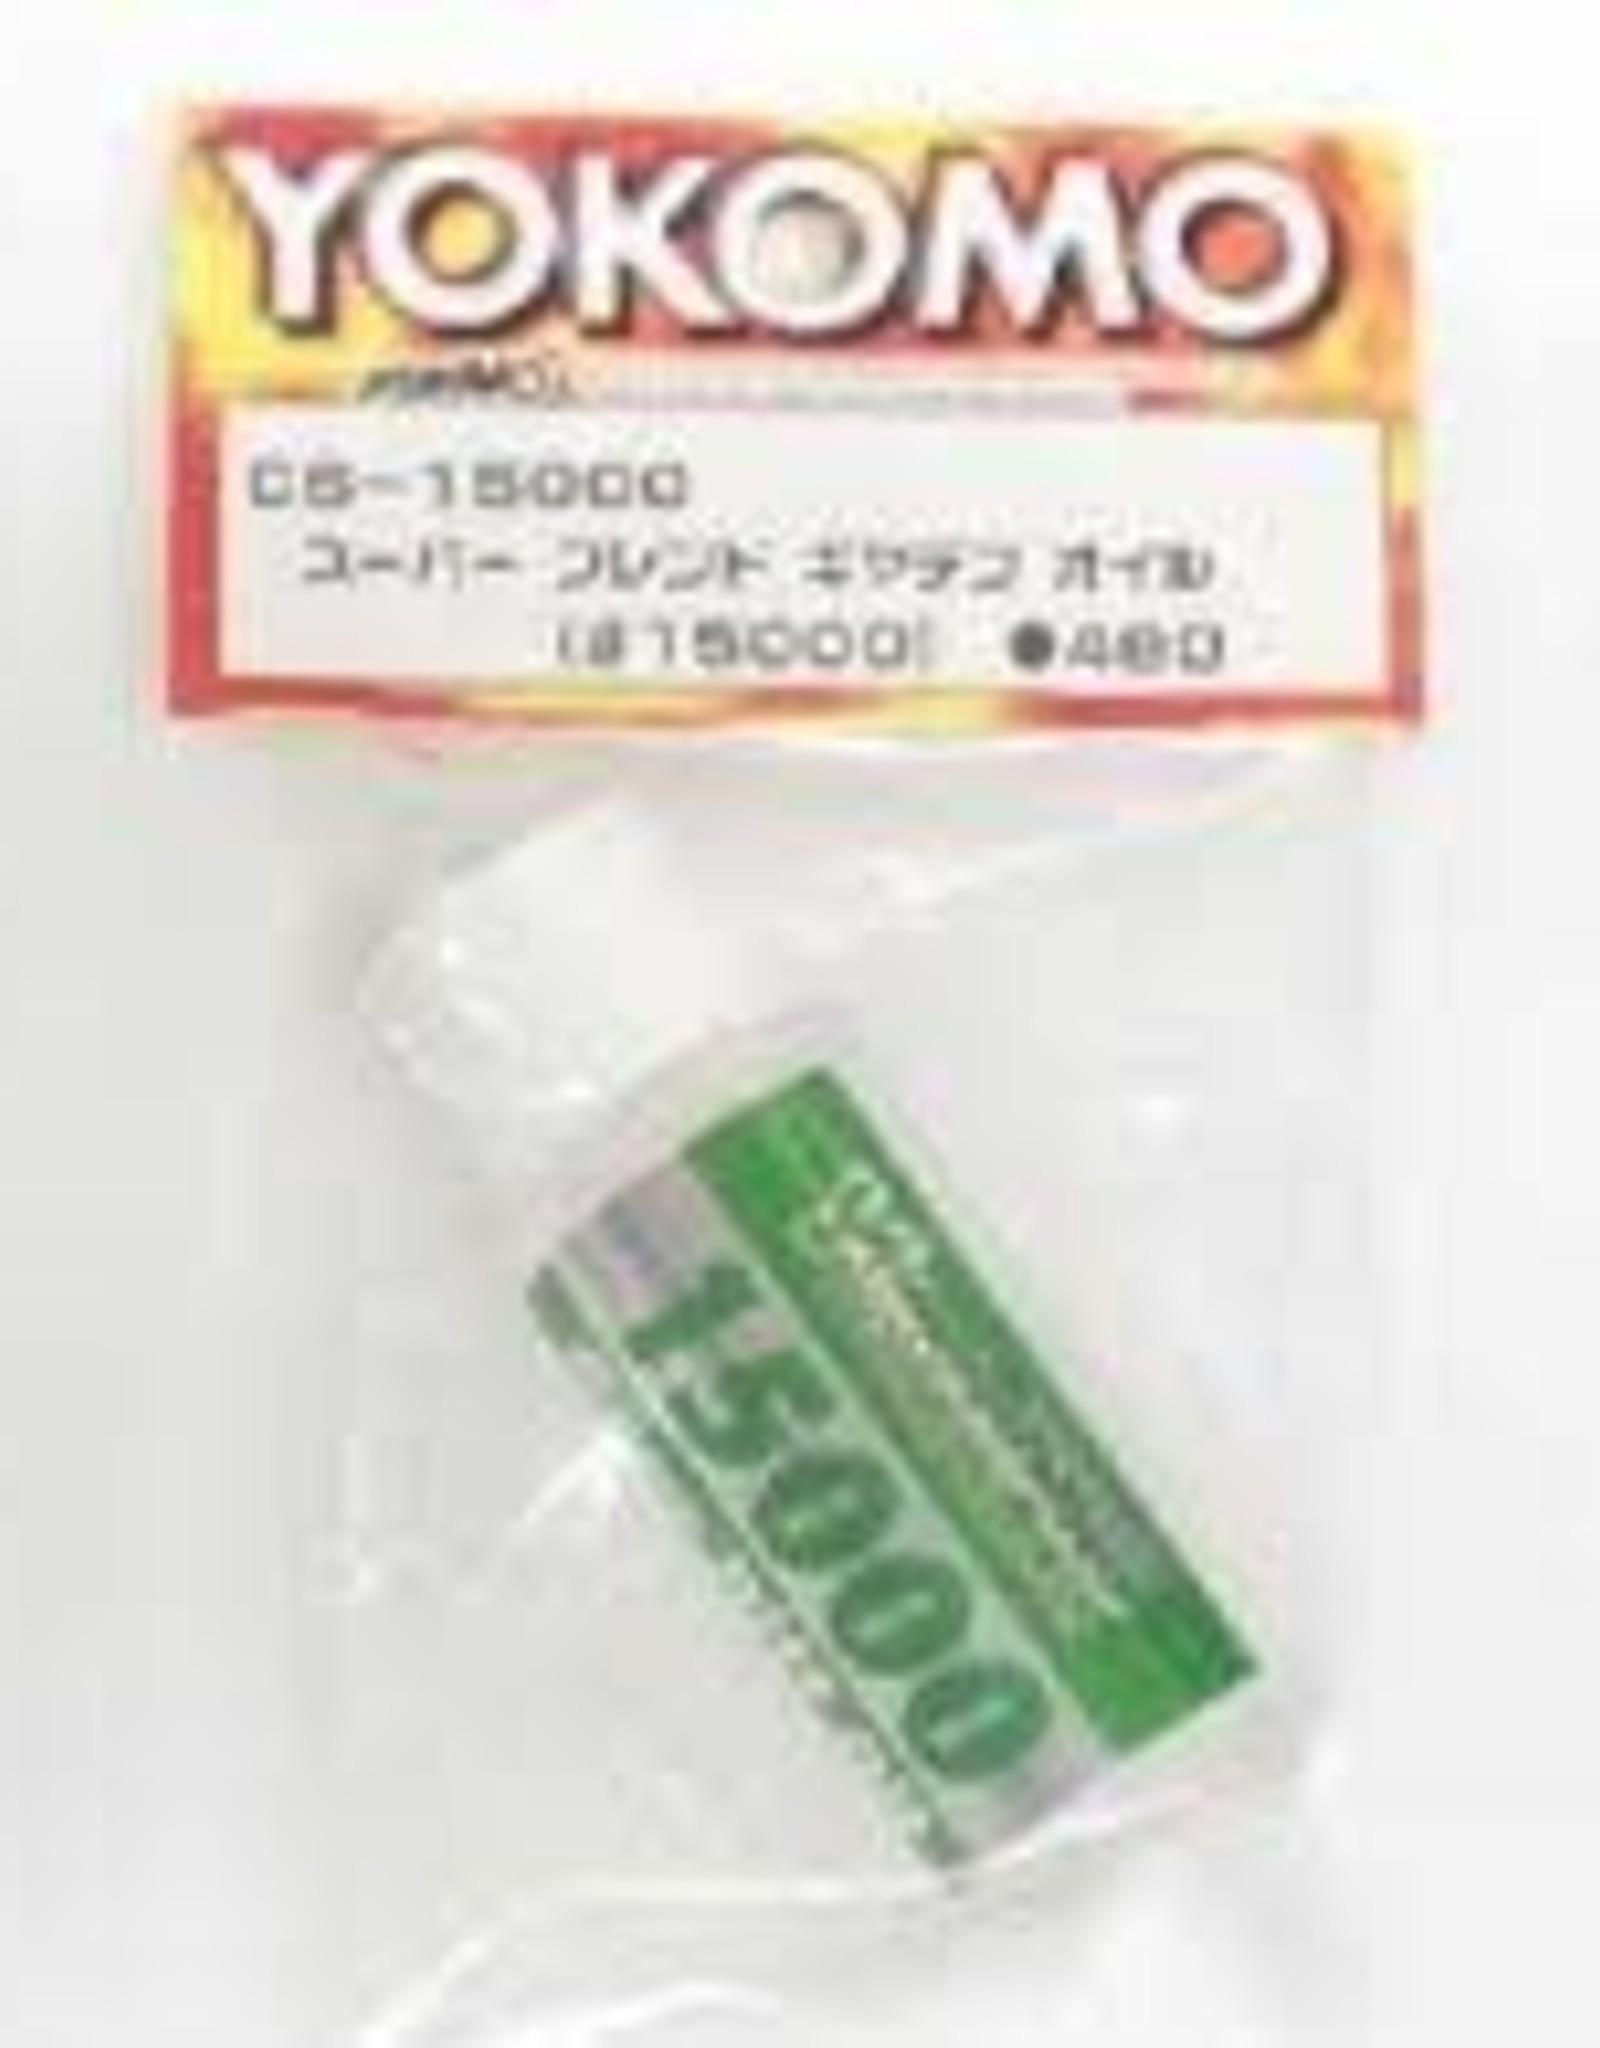 Yokomo YOKCS-15000 Super Blend Gear Differential Oil #15000 (CS-15000) by Yokomo CS-15000